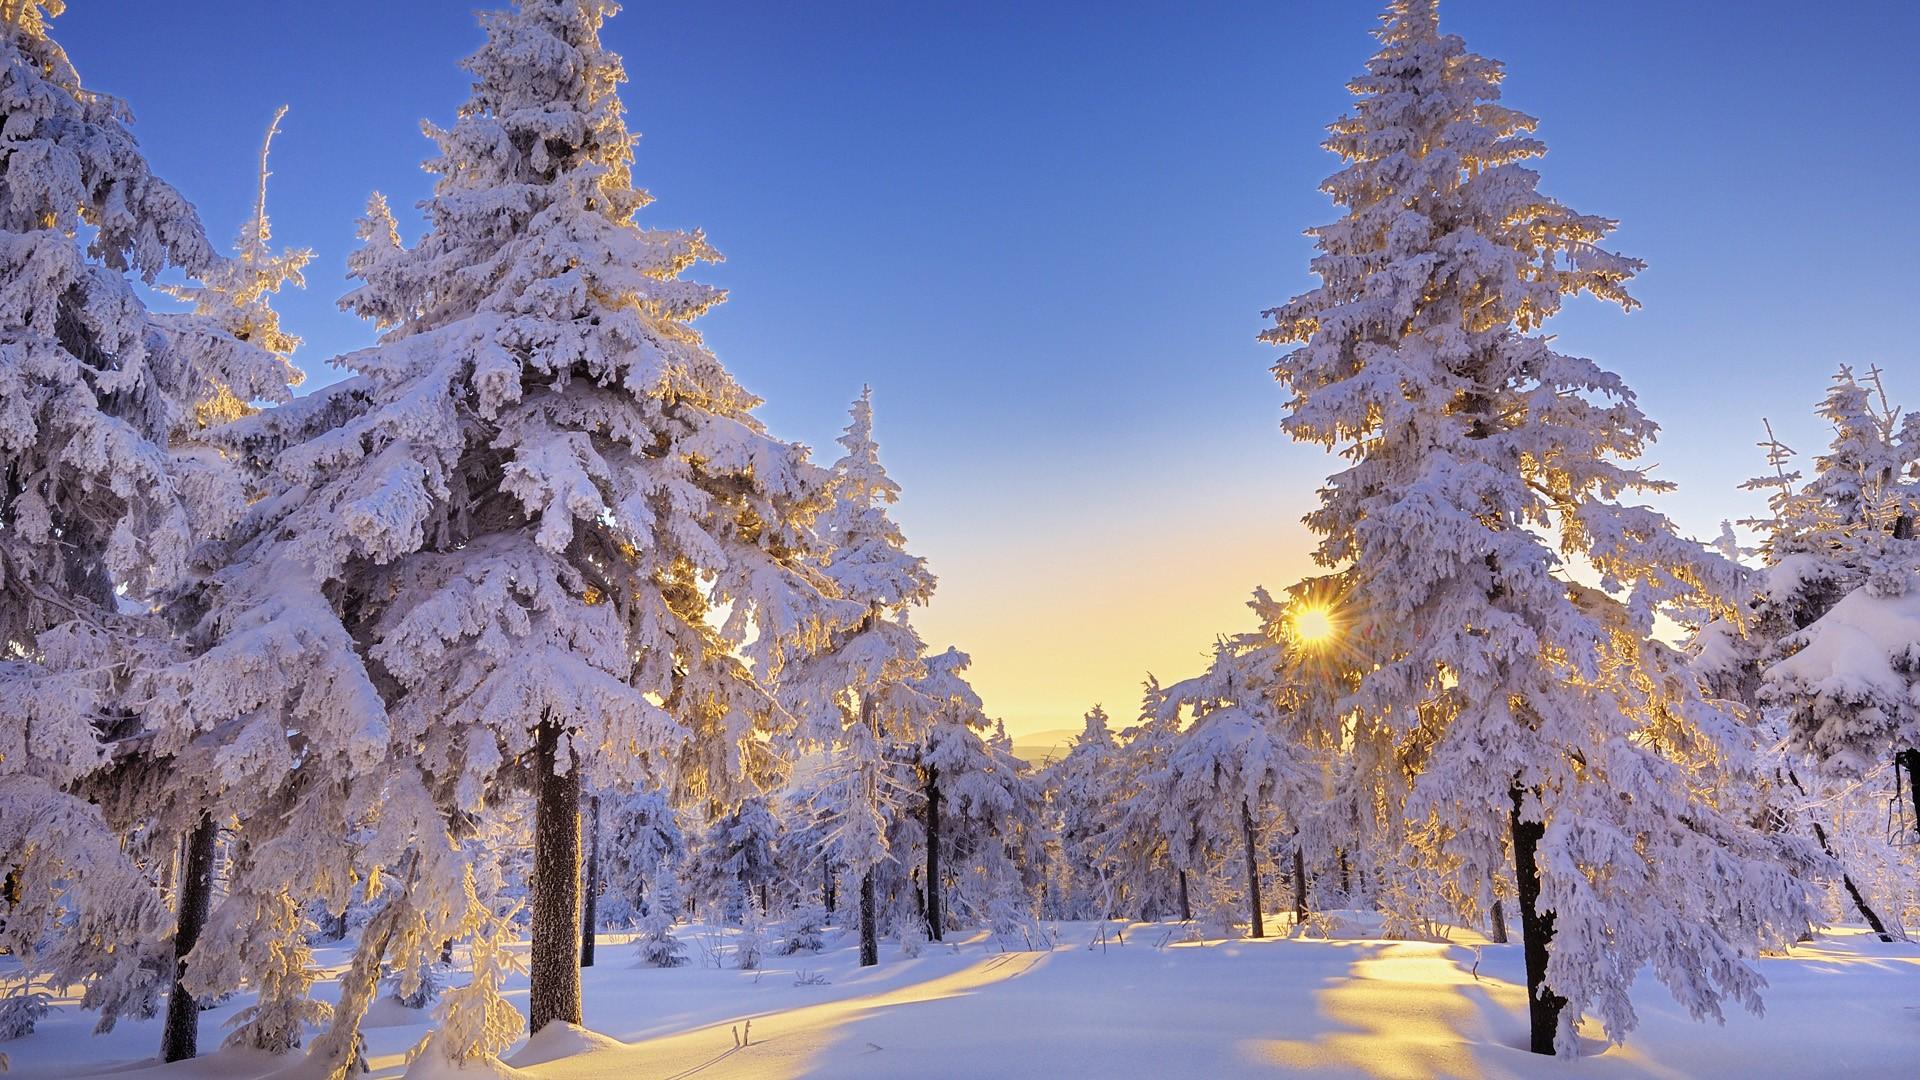 Winter Snow Wallpaper 1920x1080 Winter Snow Trees Germany 1920x1080